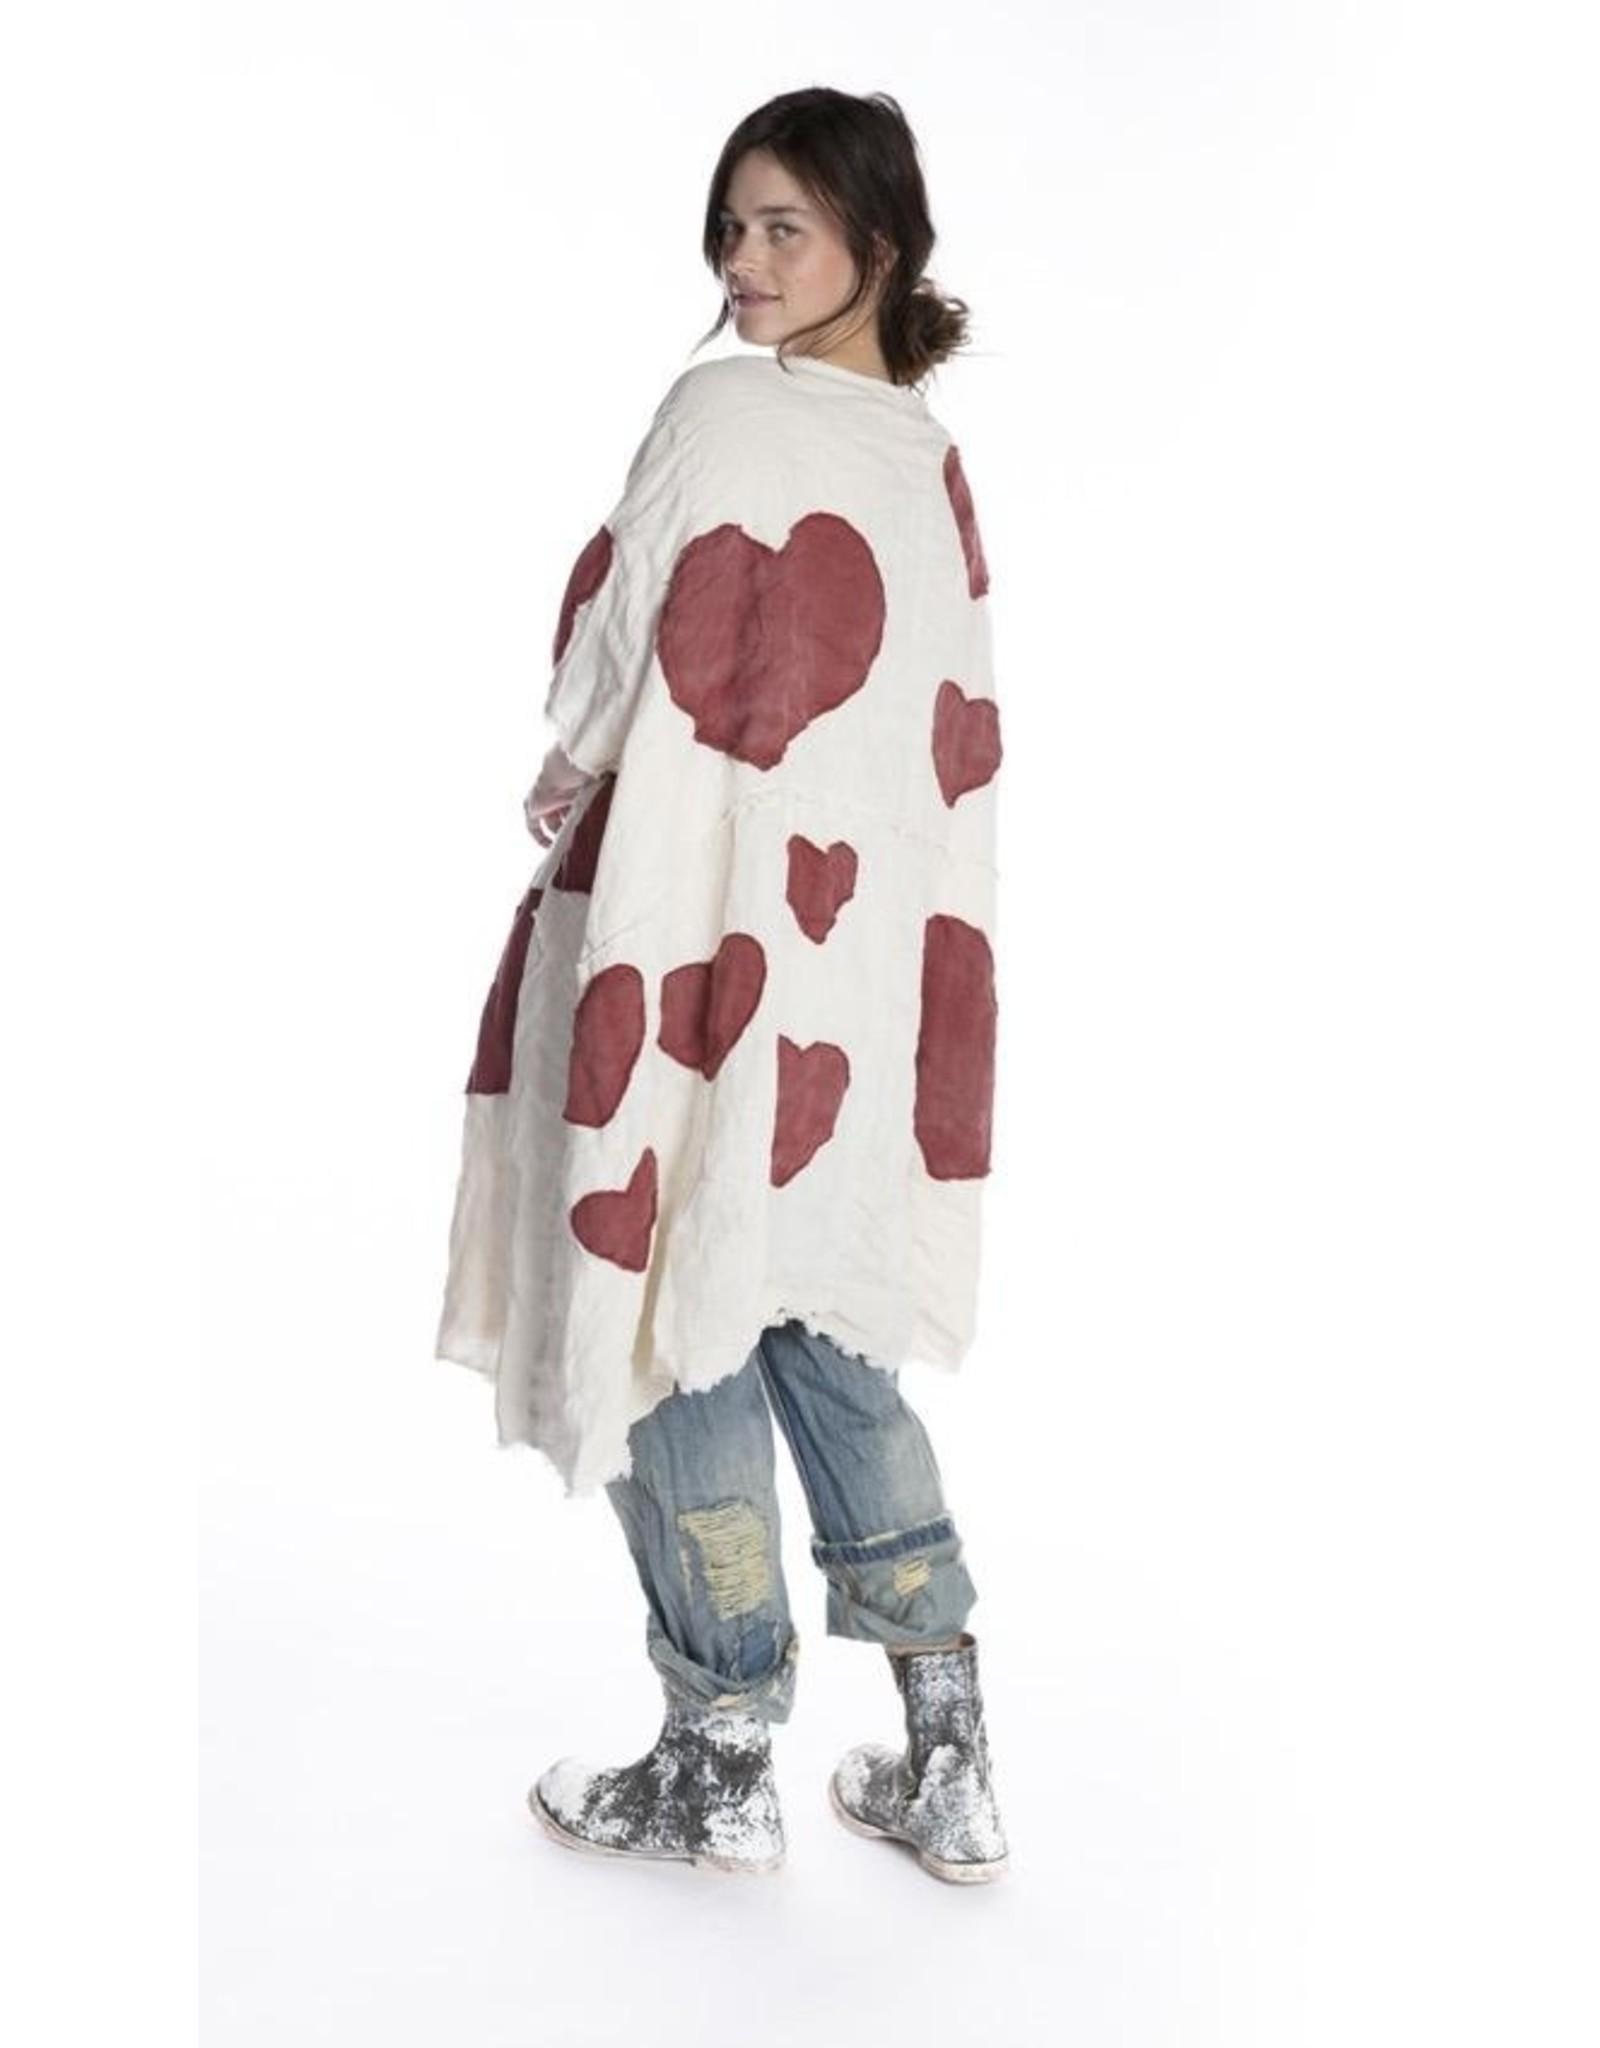 Magnolia Pearl Kimi Koat - Love